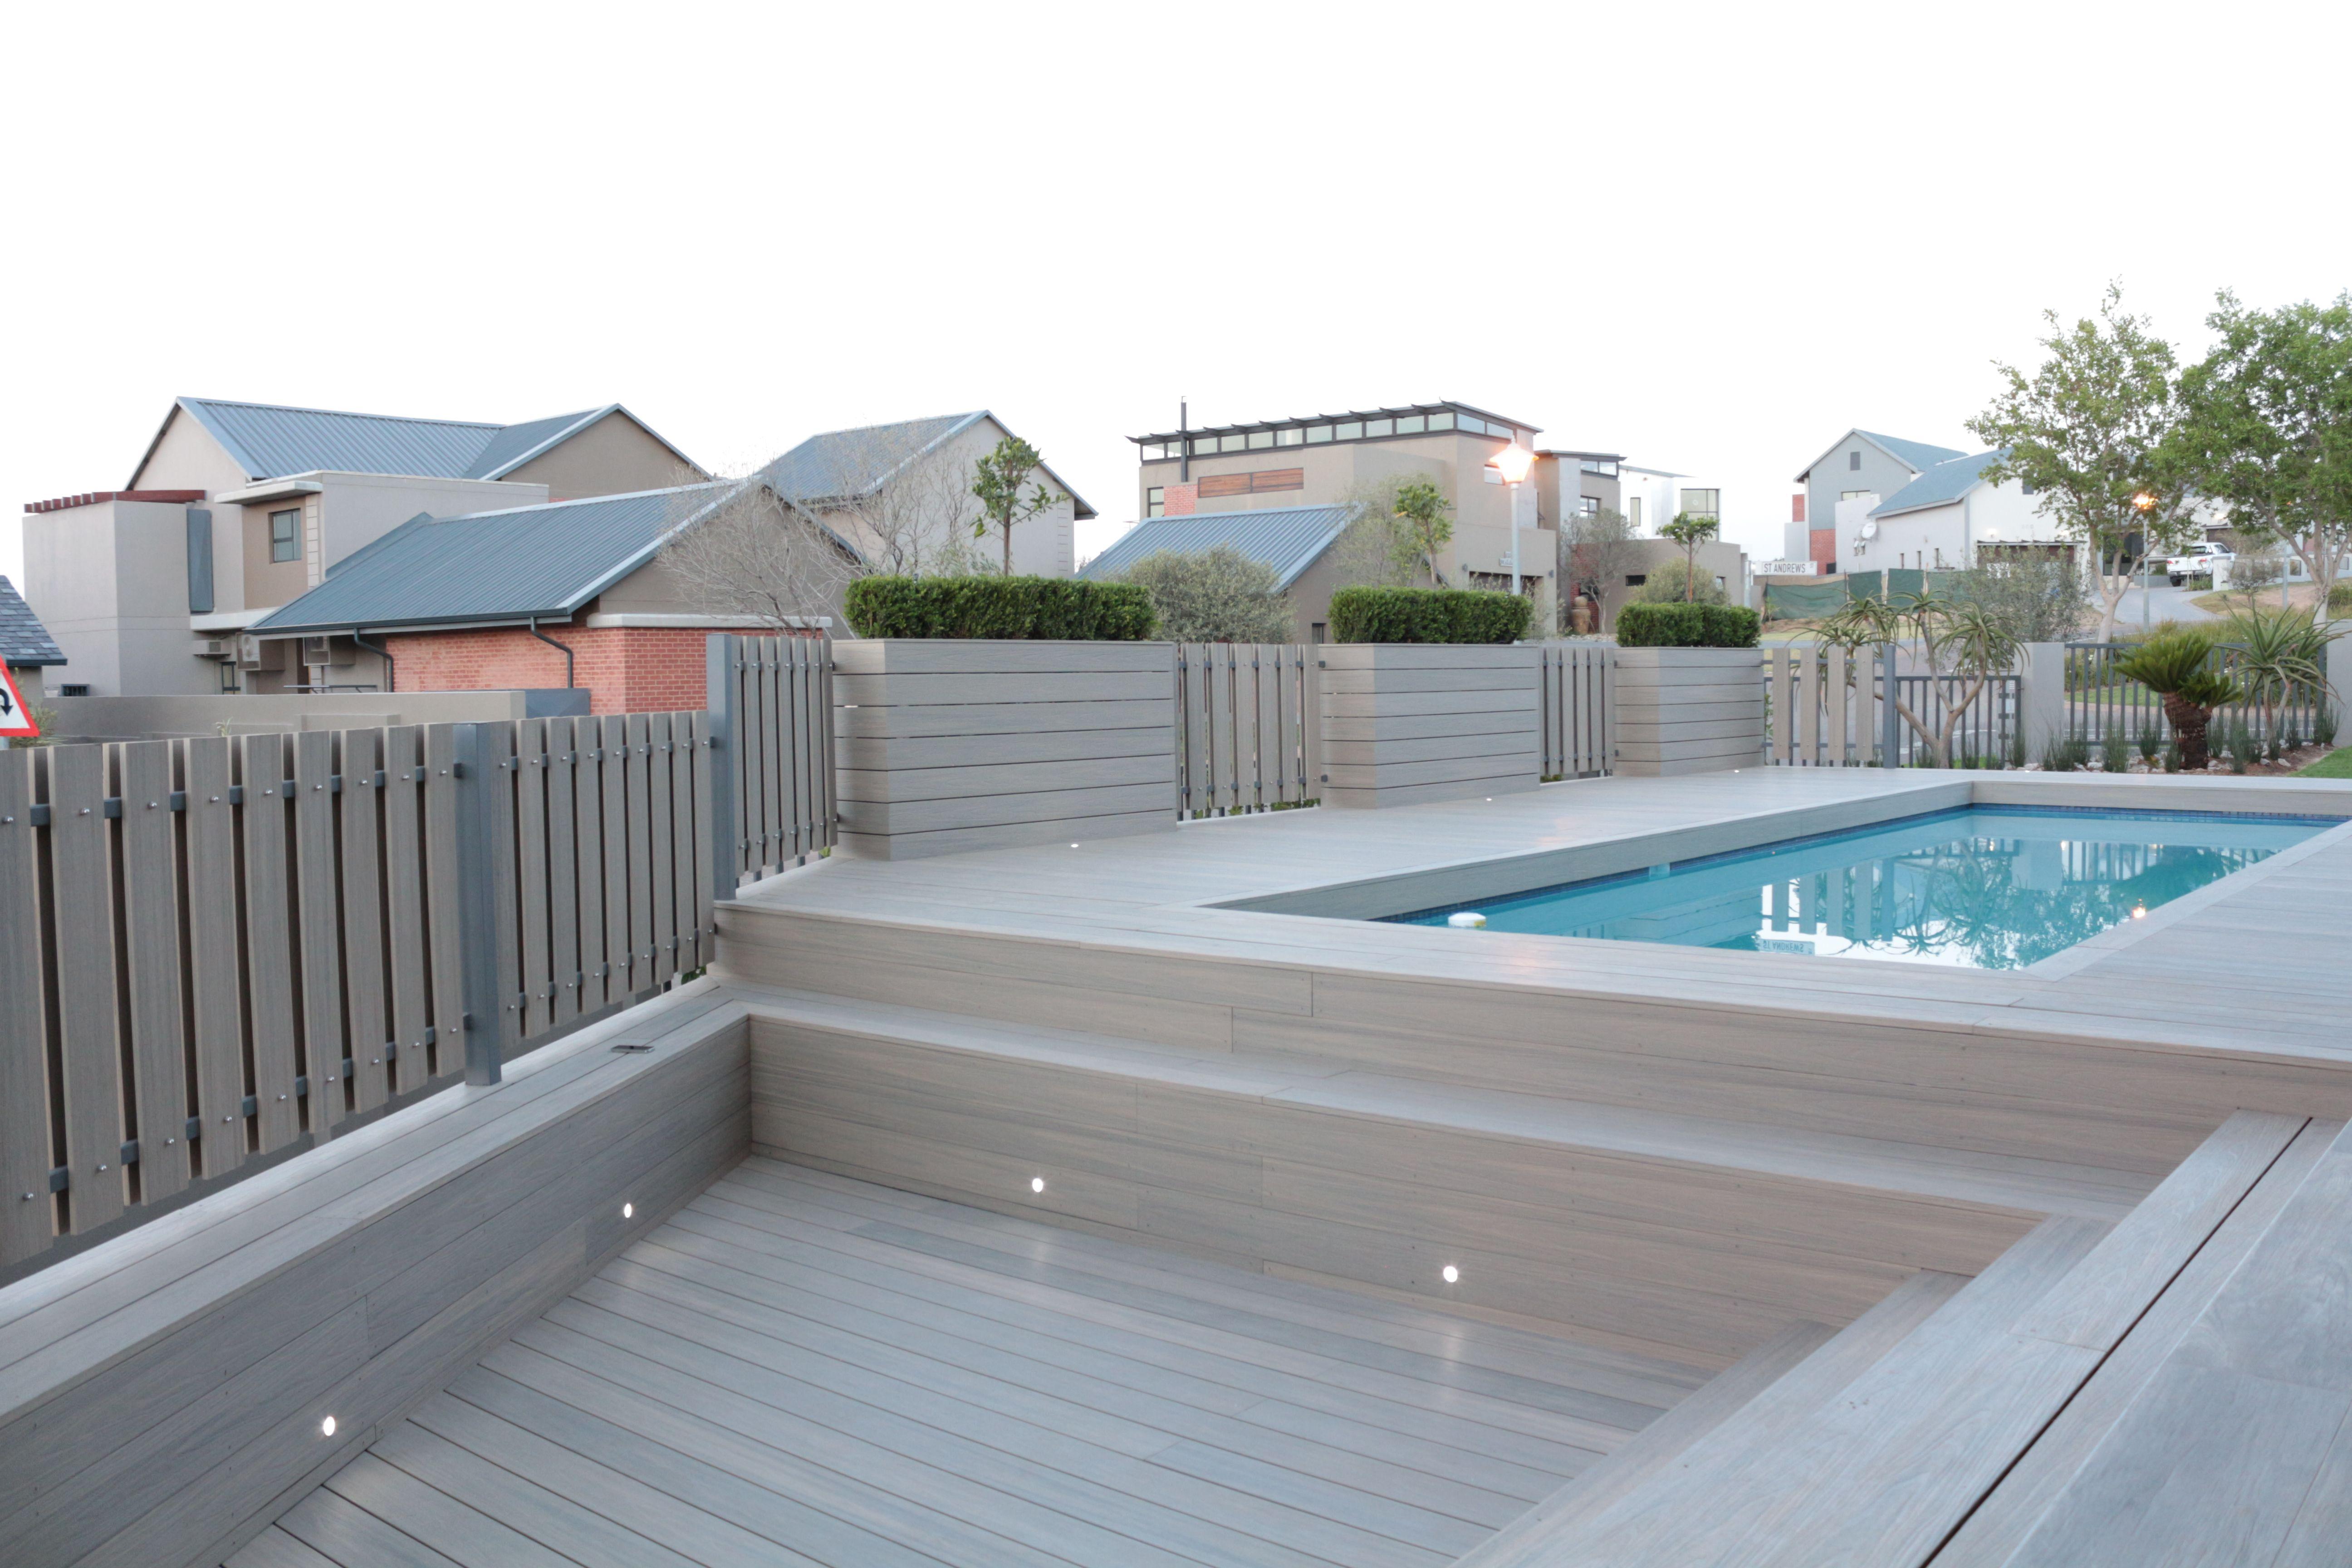 Sleek and elegant outdoor pool area created with newtechwood